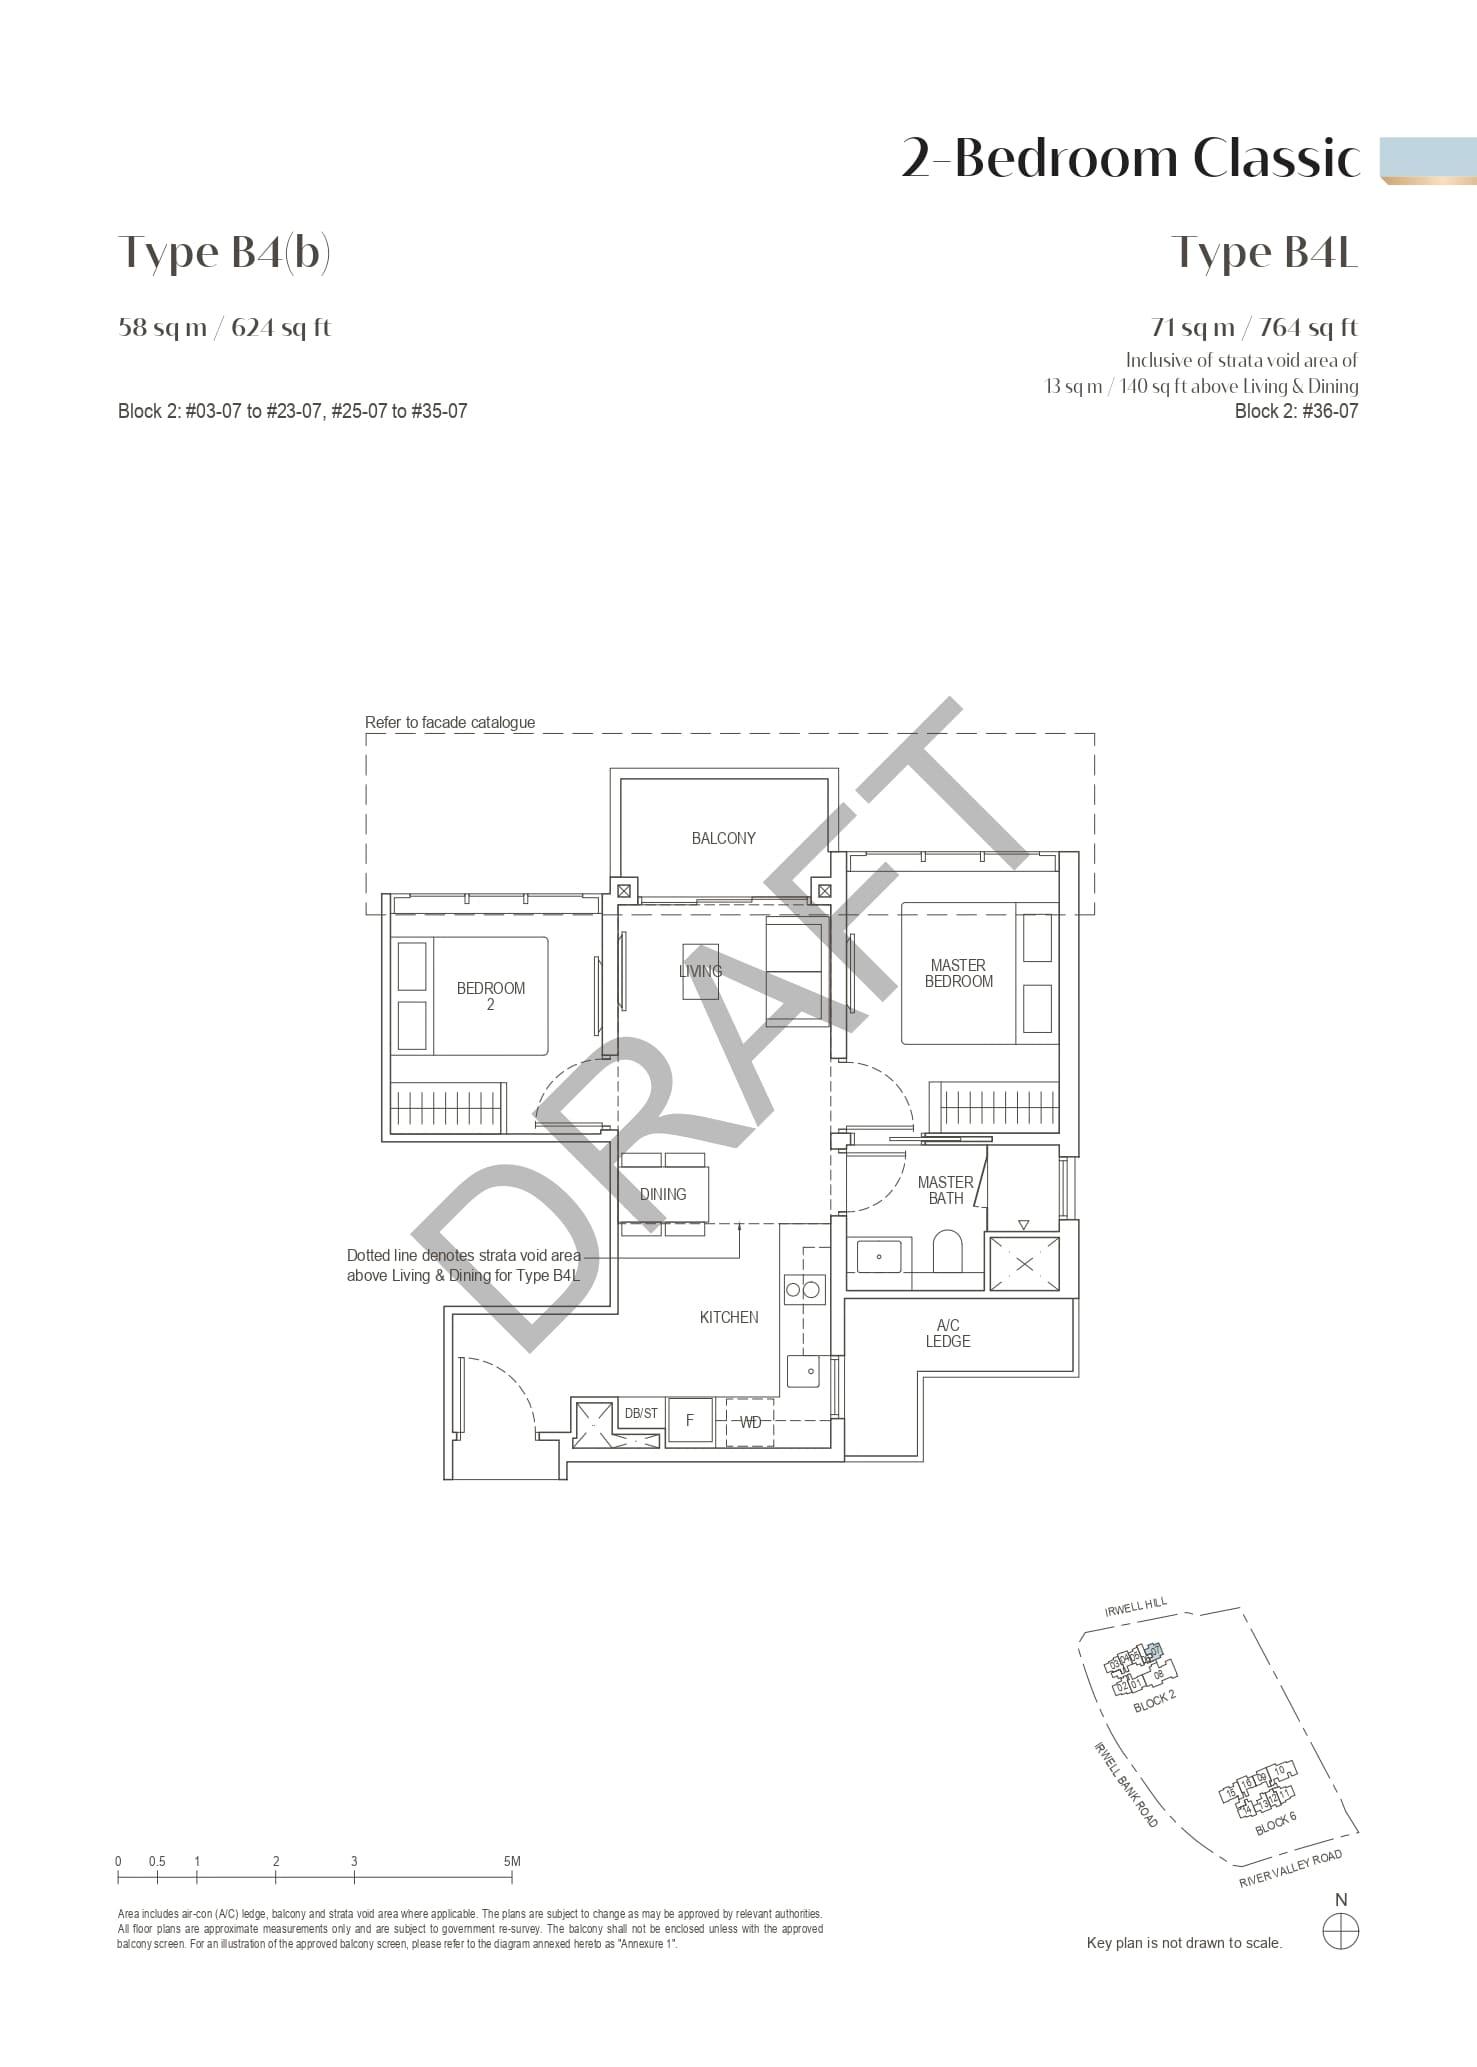 irwell-hill-residences-floor-plan-2-bedroom-classic-type-b4b